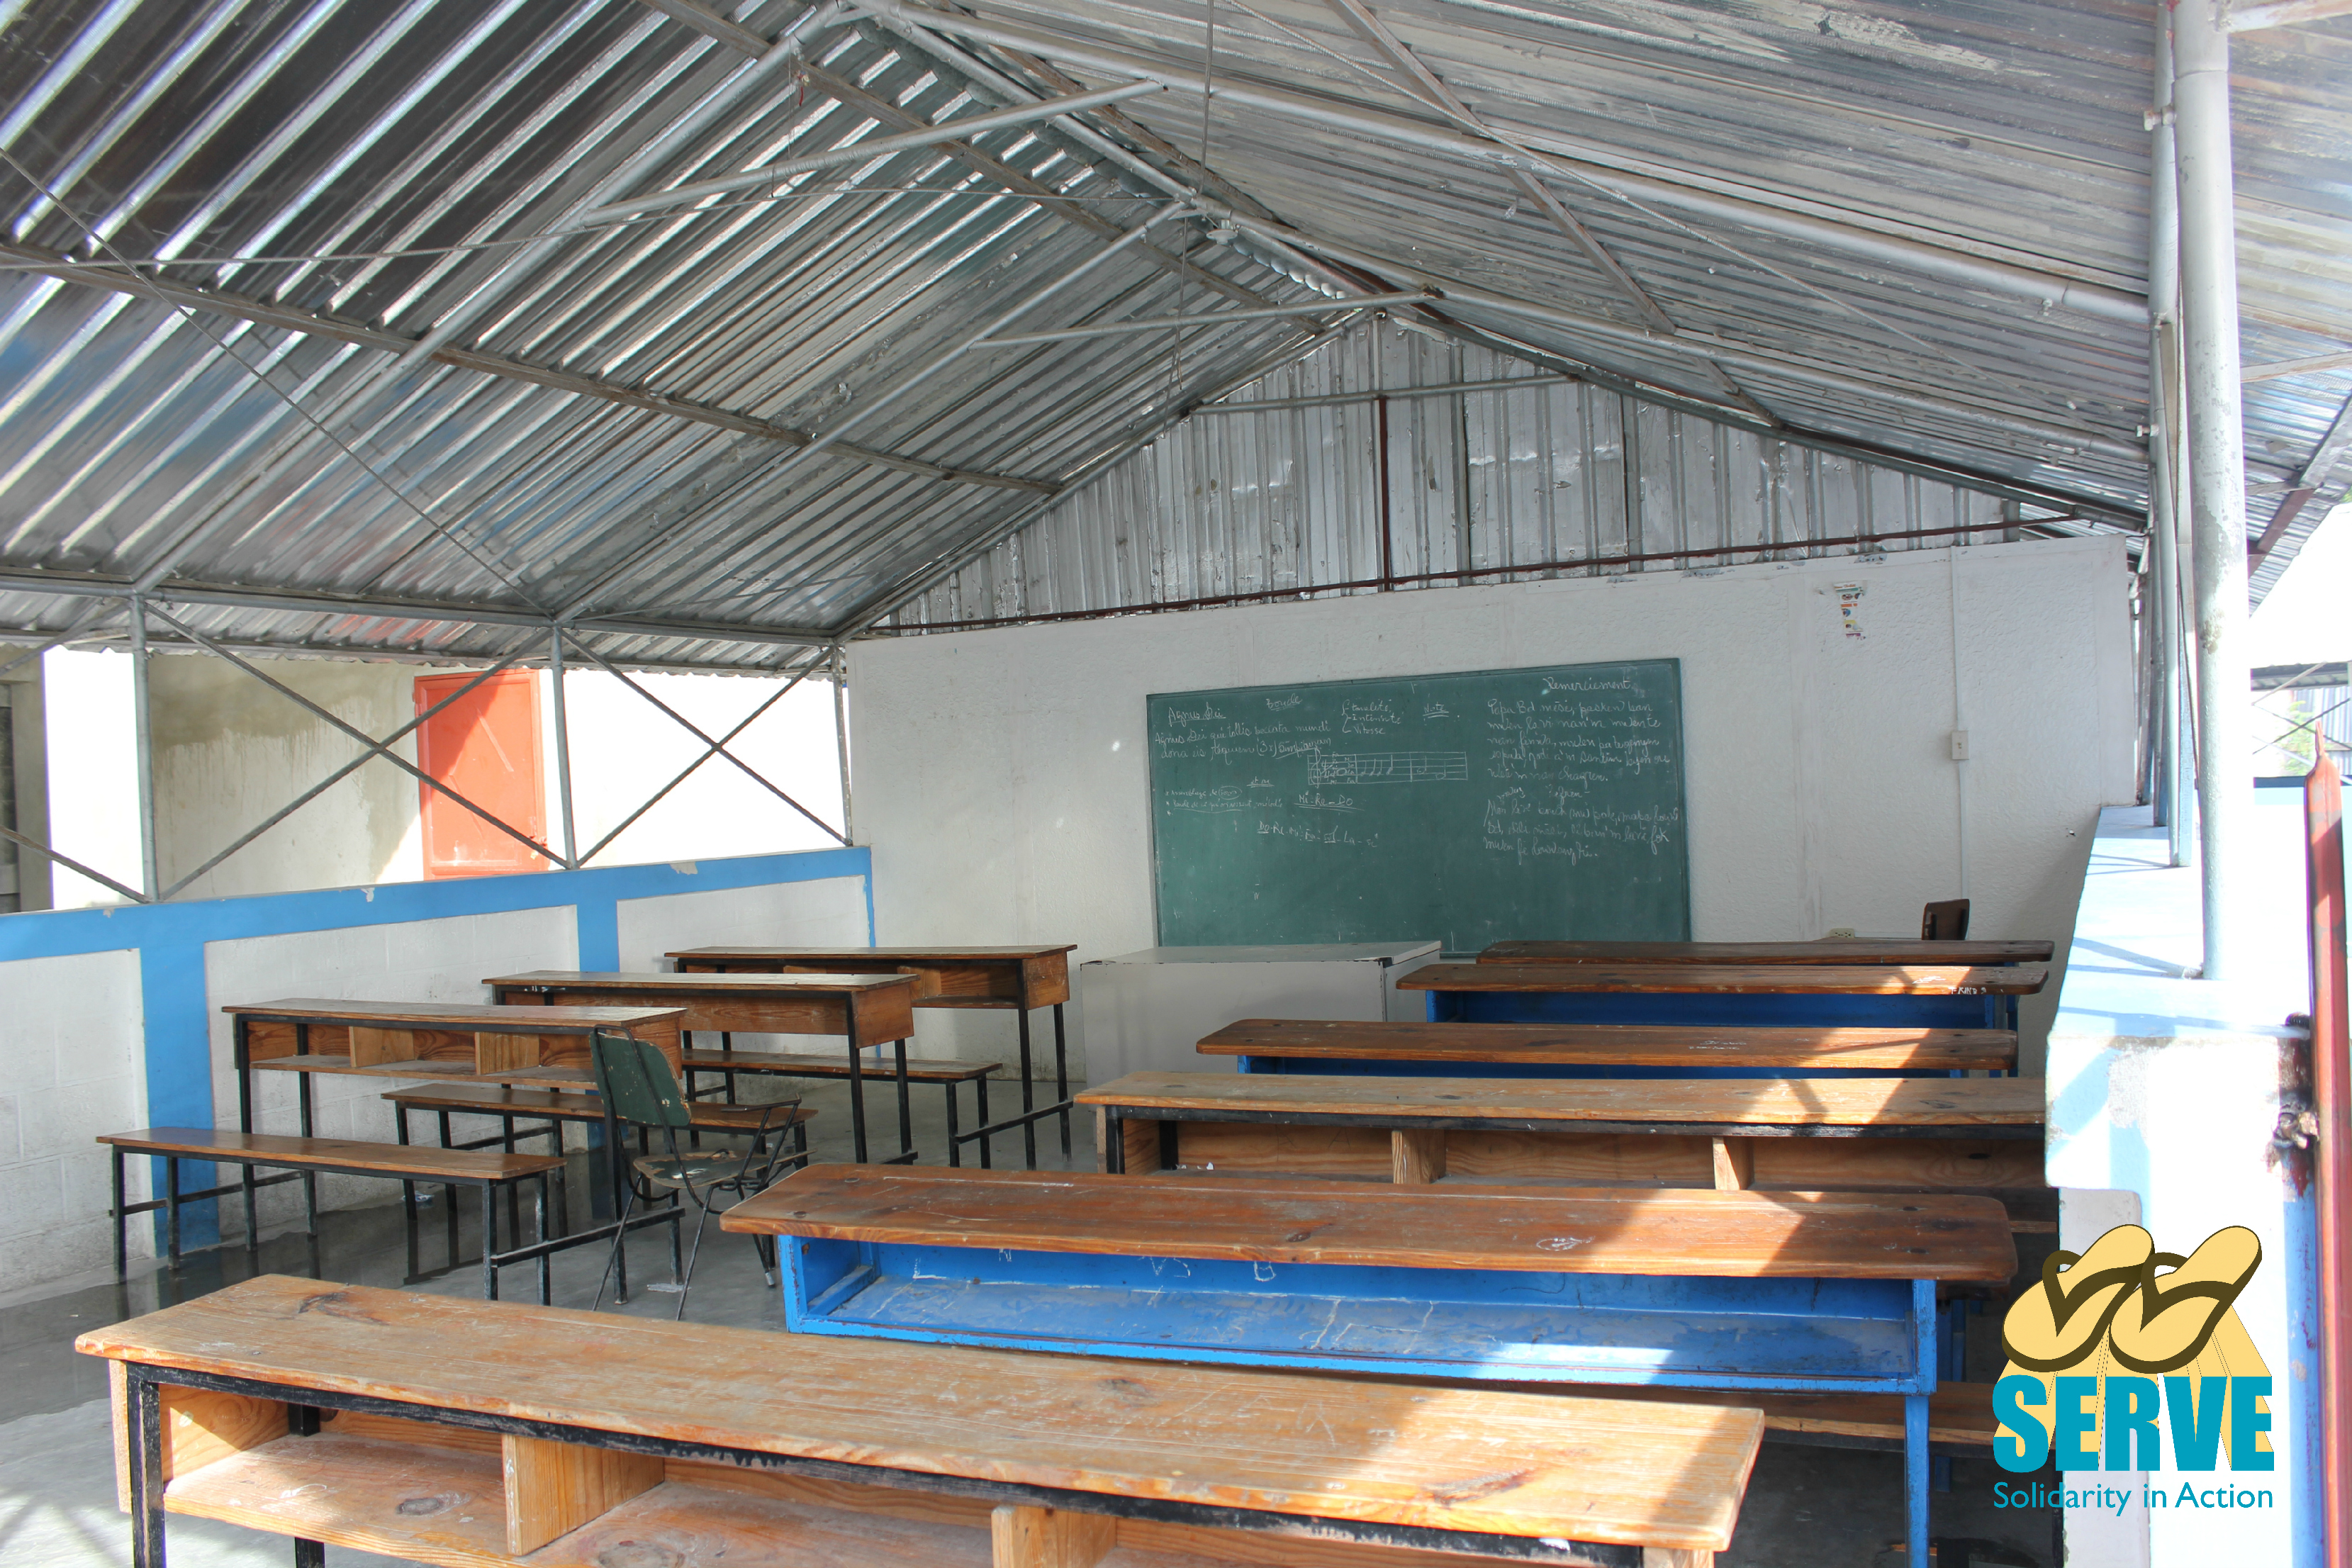 St Gerards Transitional School